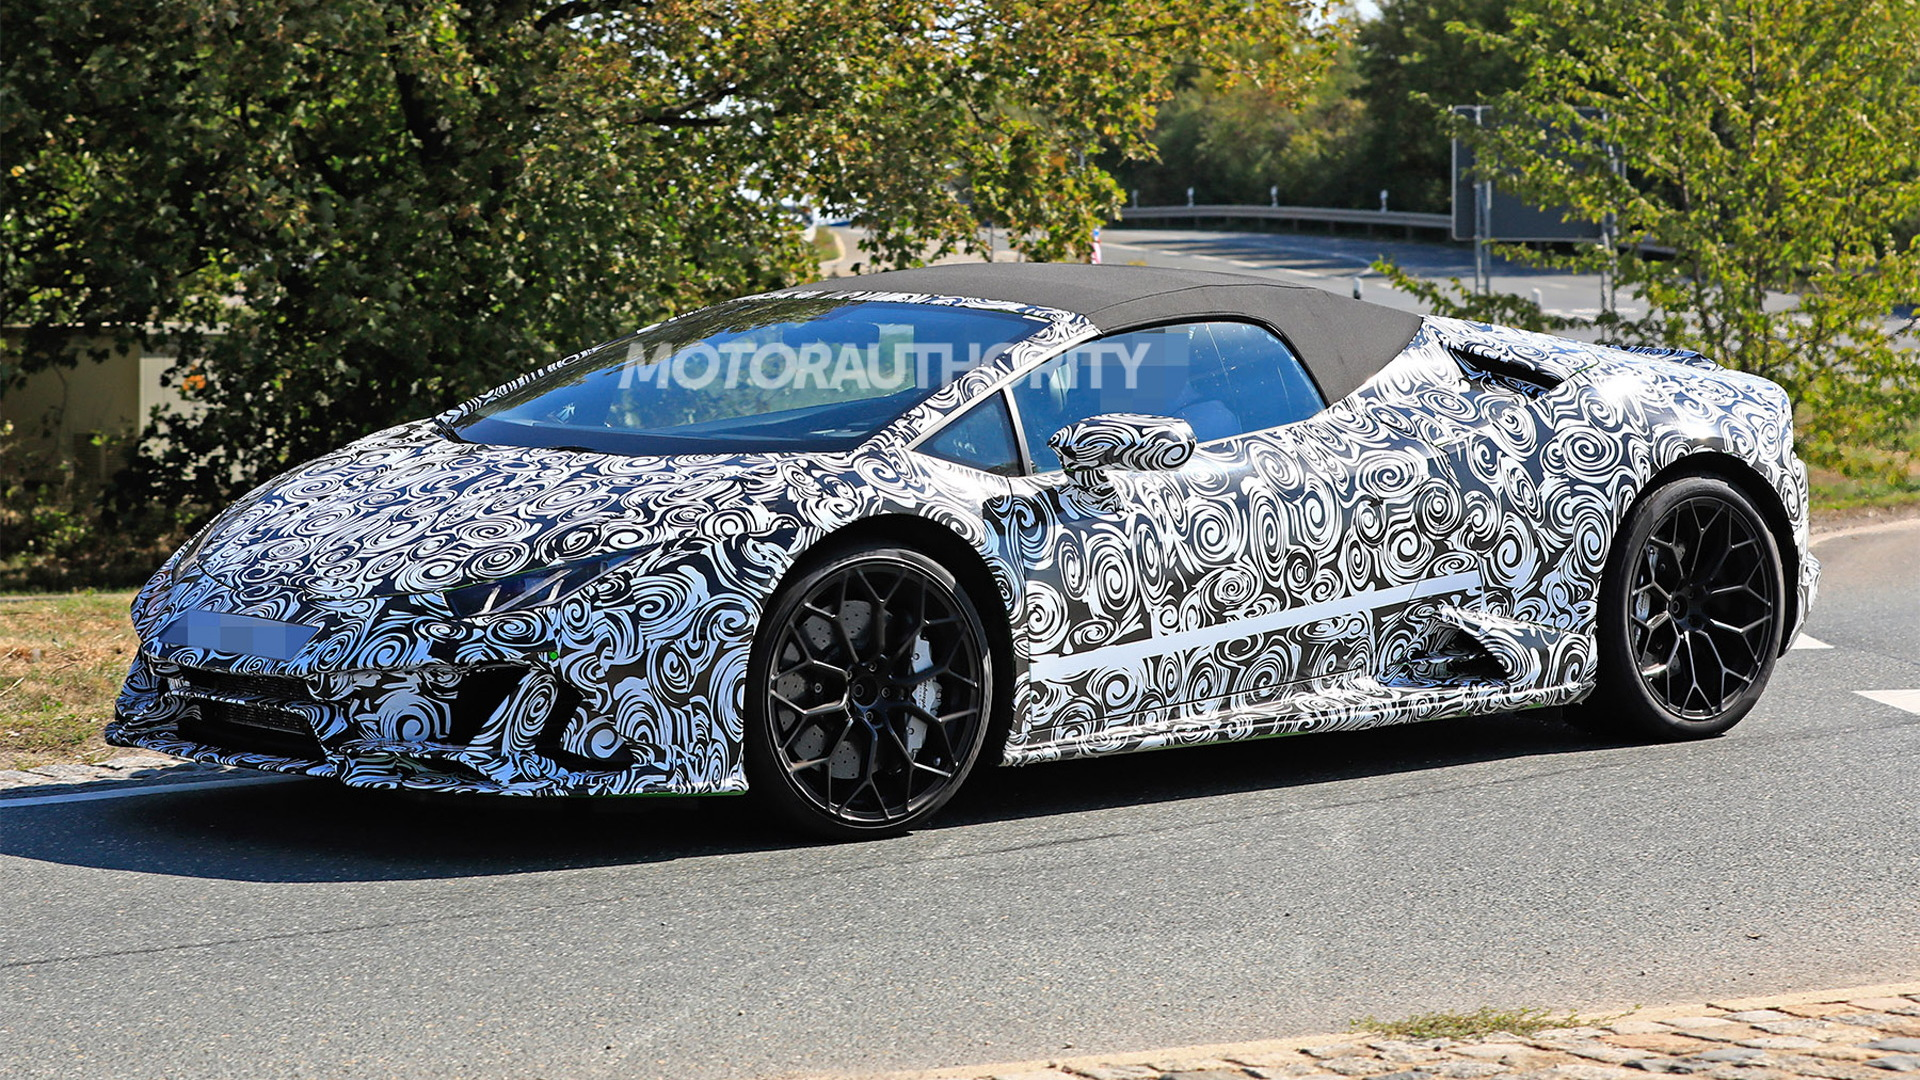 2020 Lamborghini Huracan Spyder facelift spy shots - Image via S. Baldauf/SB-Medien